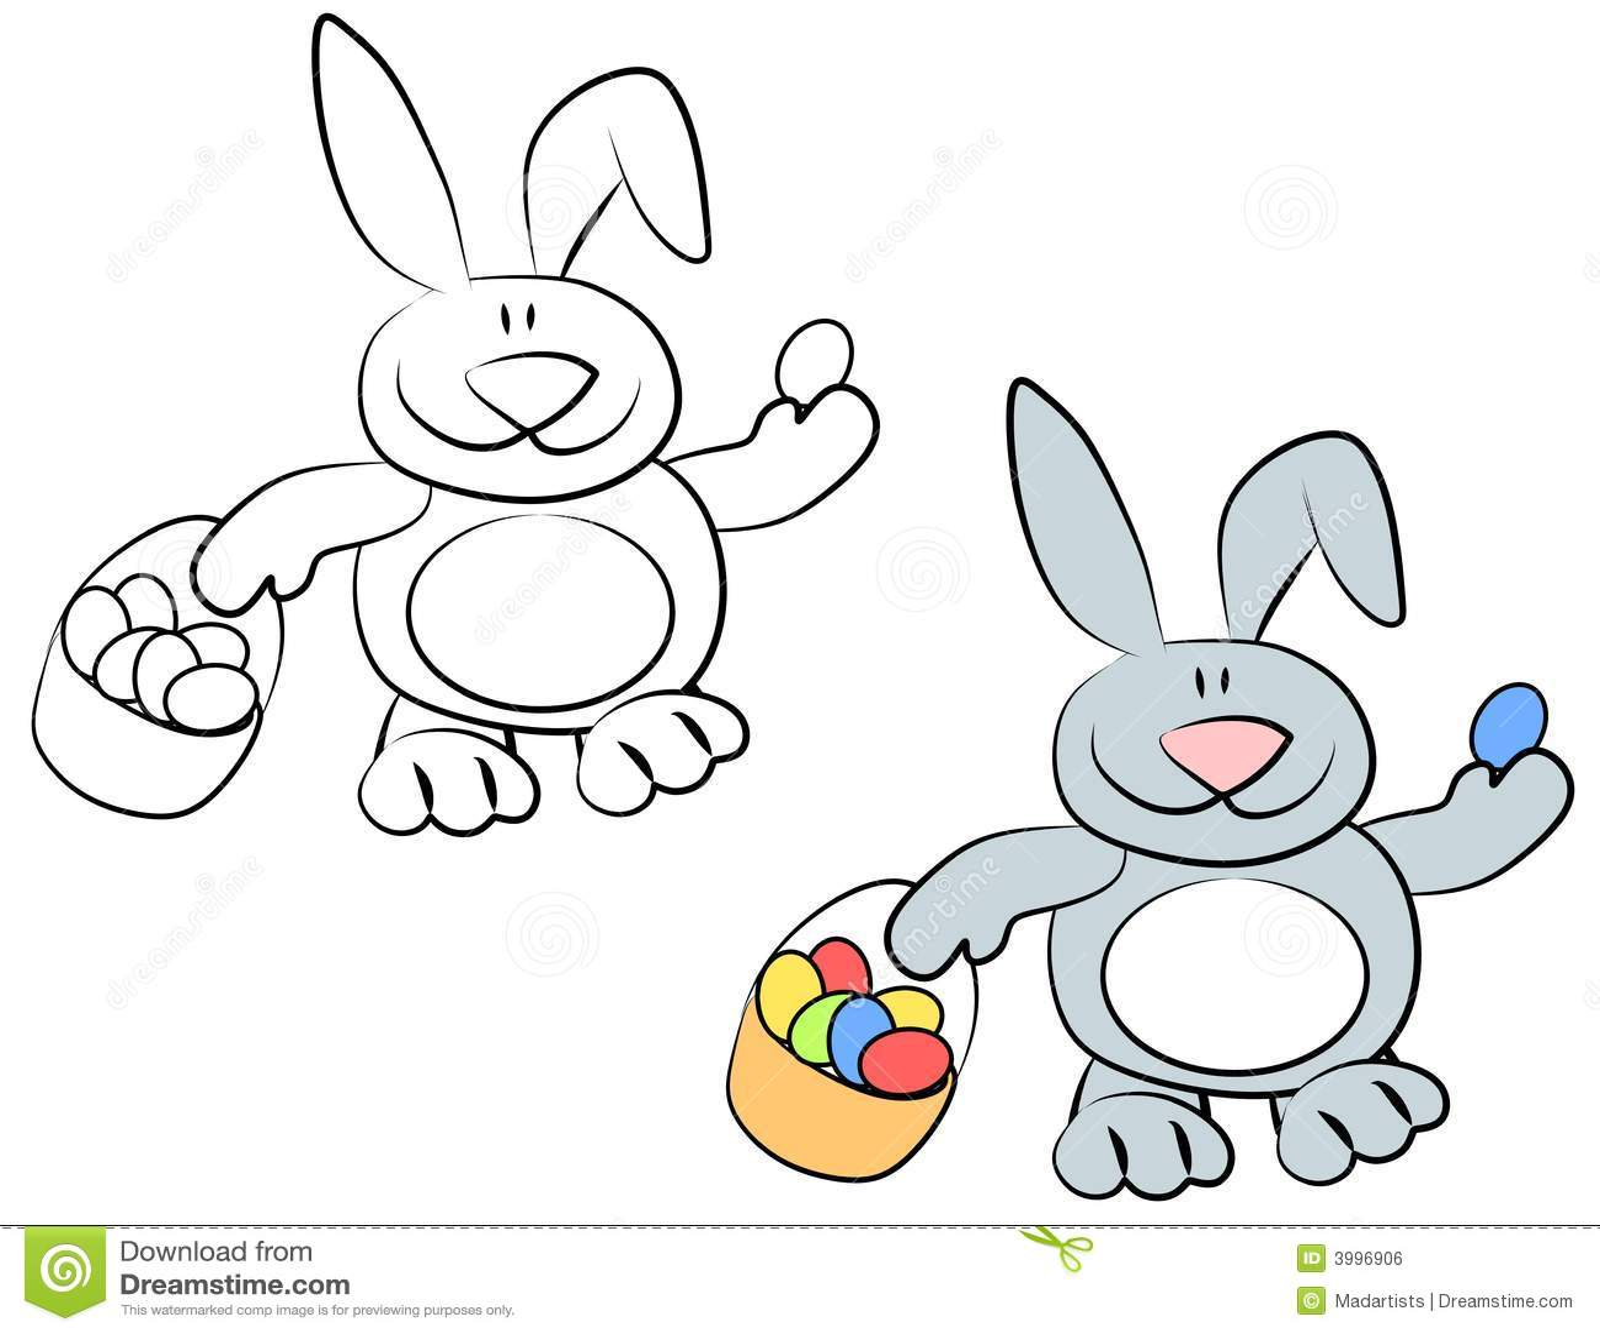 Cartoon Smiling Easter Bunny Rabbits Royalty Free Stock